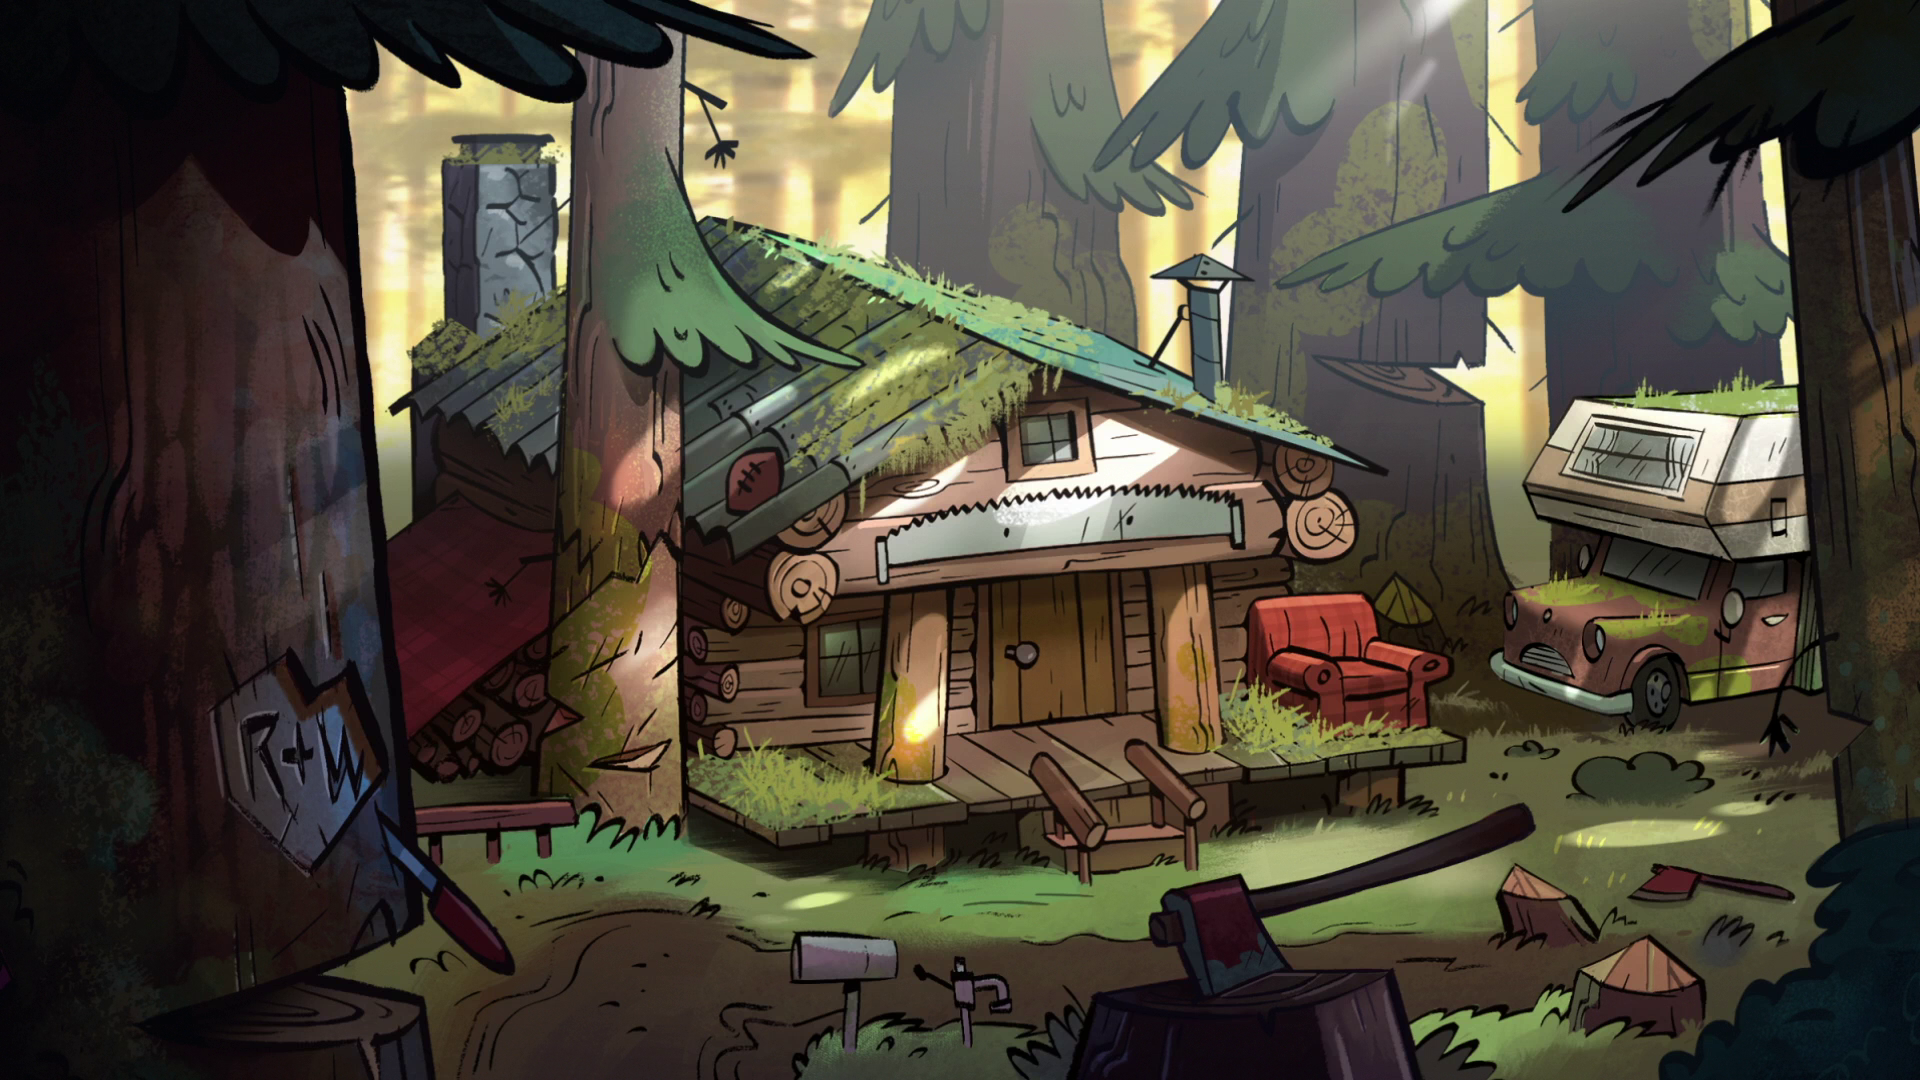 Corduroy cabin